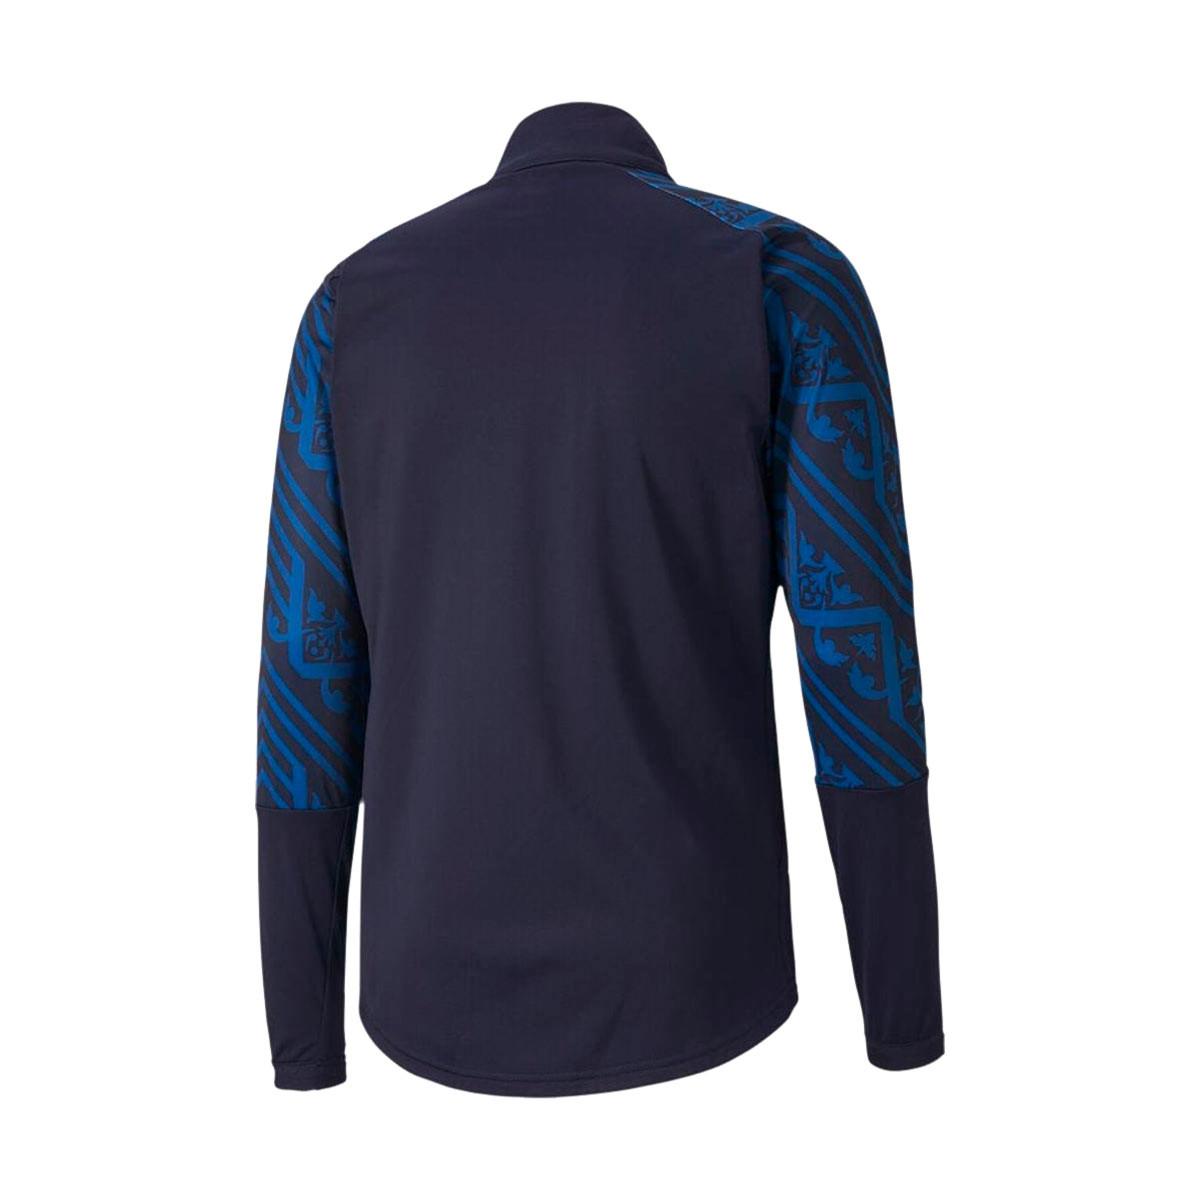 lanzador Bloquear Mariscos  Jacket Puma Italia Stadium Segunda Equipación 2019-2020 Peacoat-Team Power  Blue - Football store Fútbol Emotion